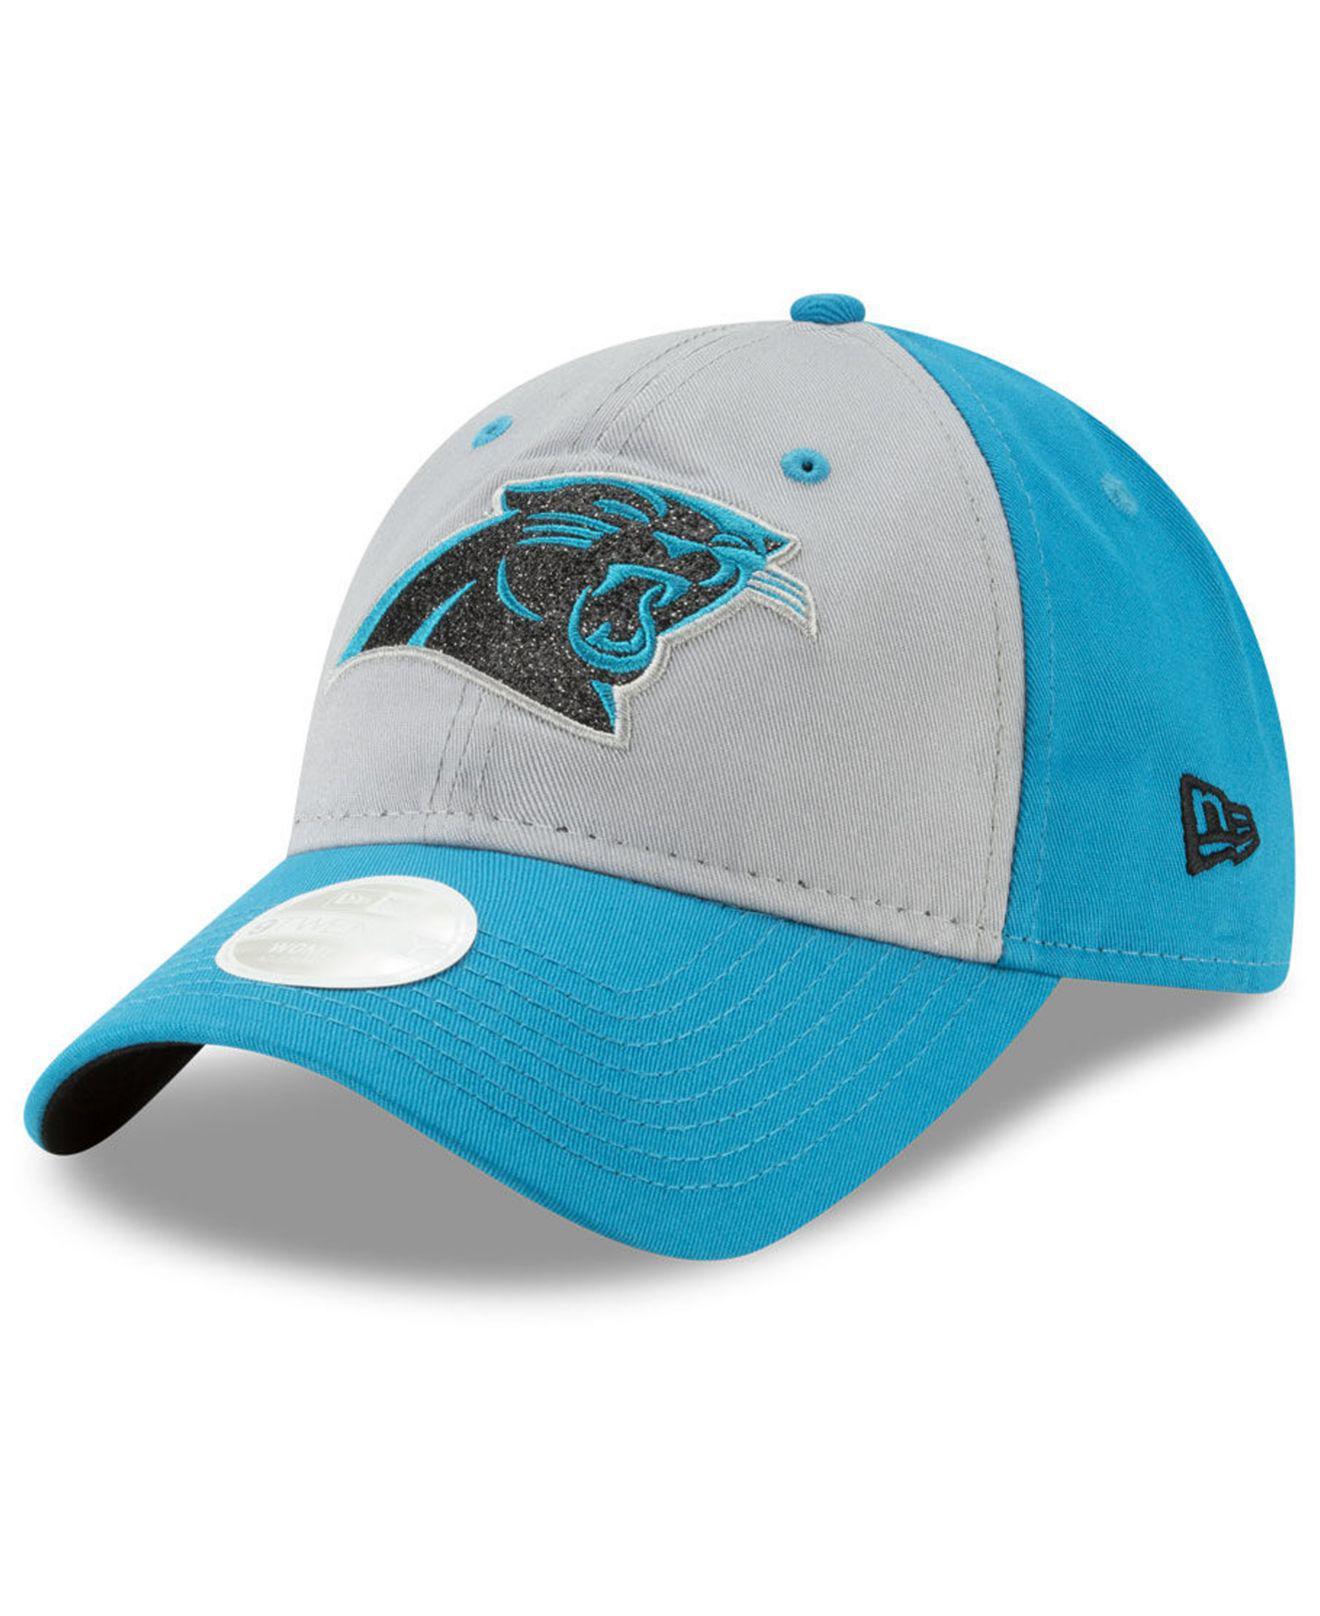 best service 7c8cb 1d411 Lyst - KTZ Carolina Panthers Gray Glitter 9twenty Cap in Blue